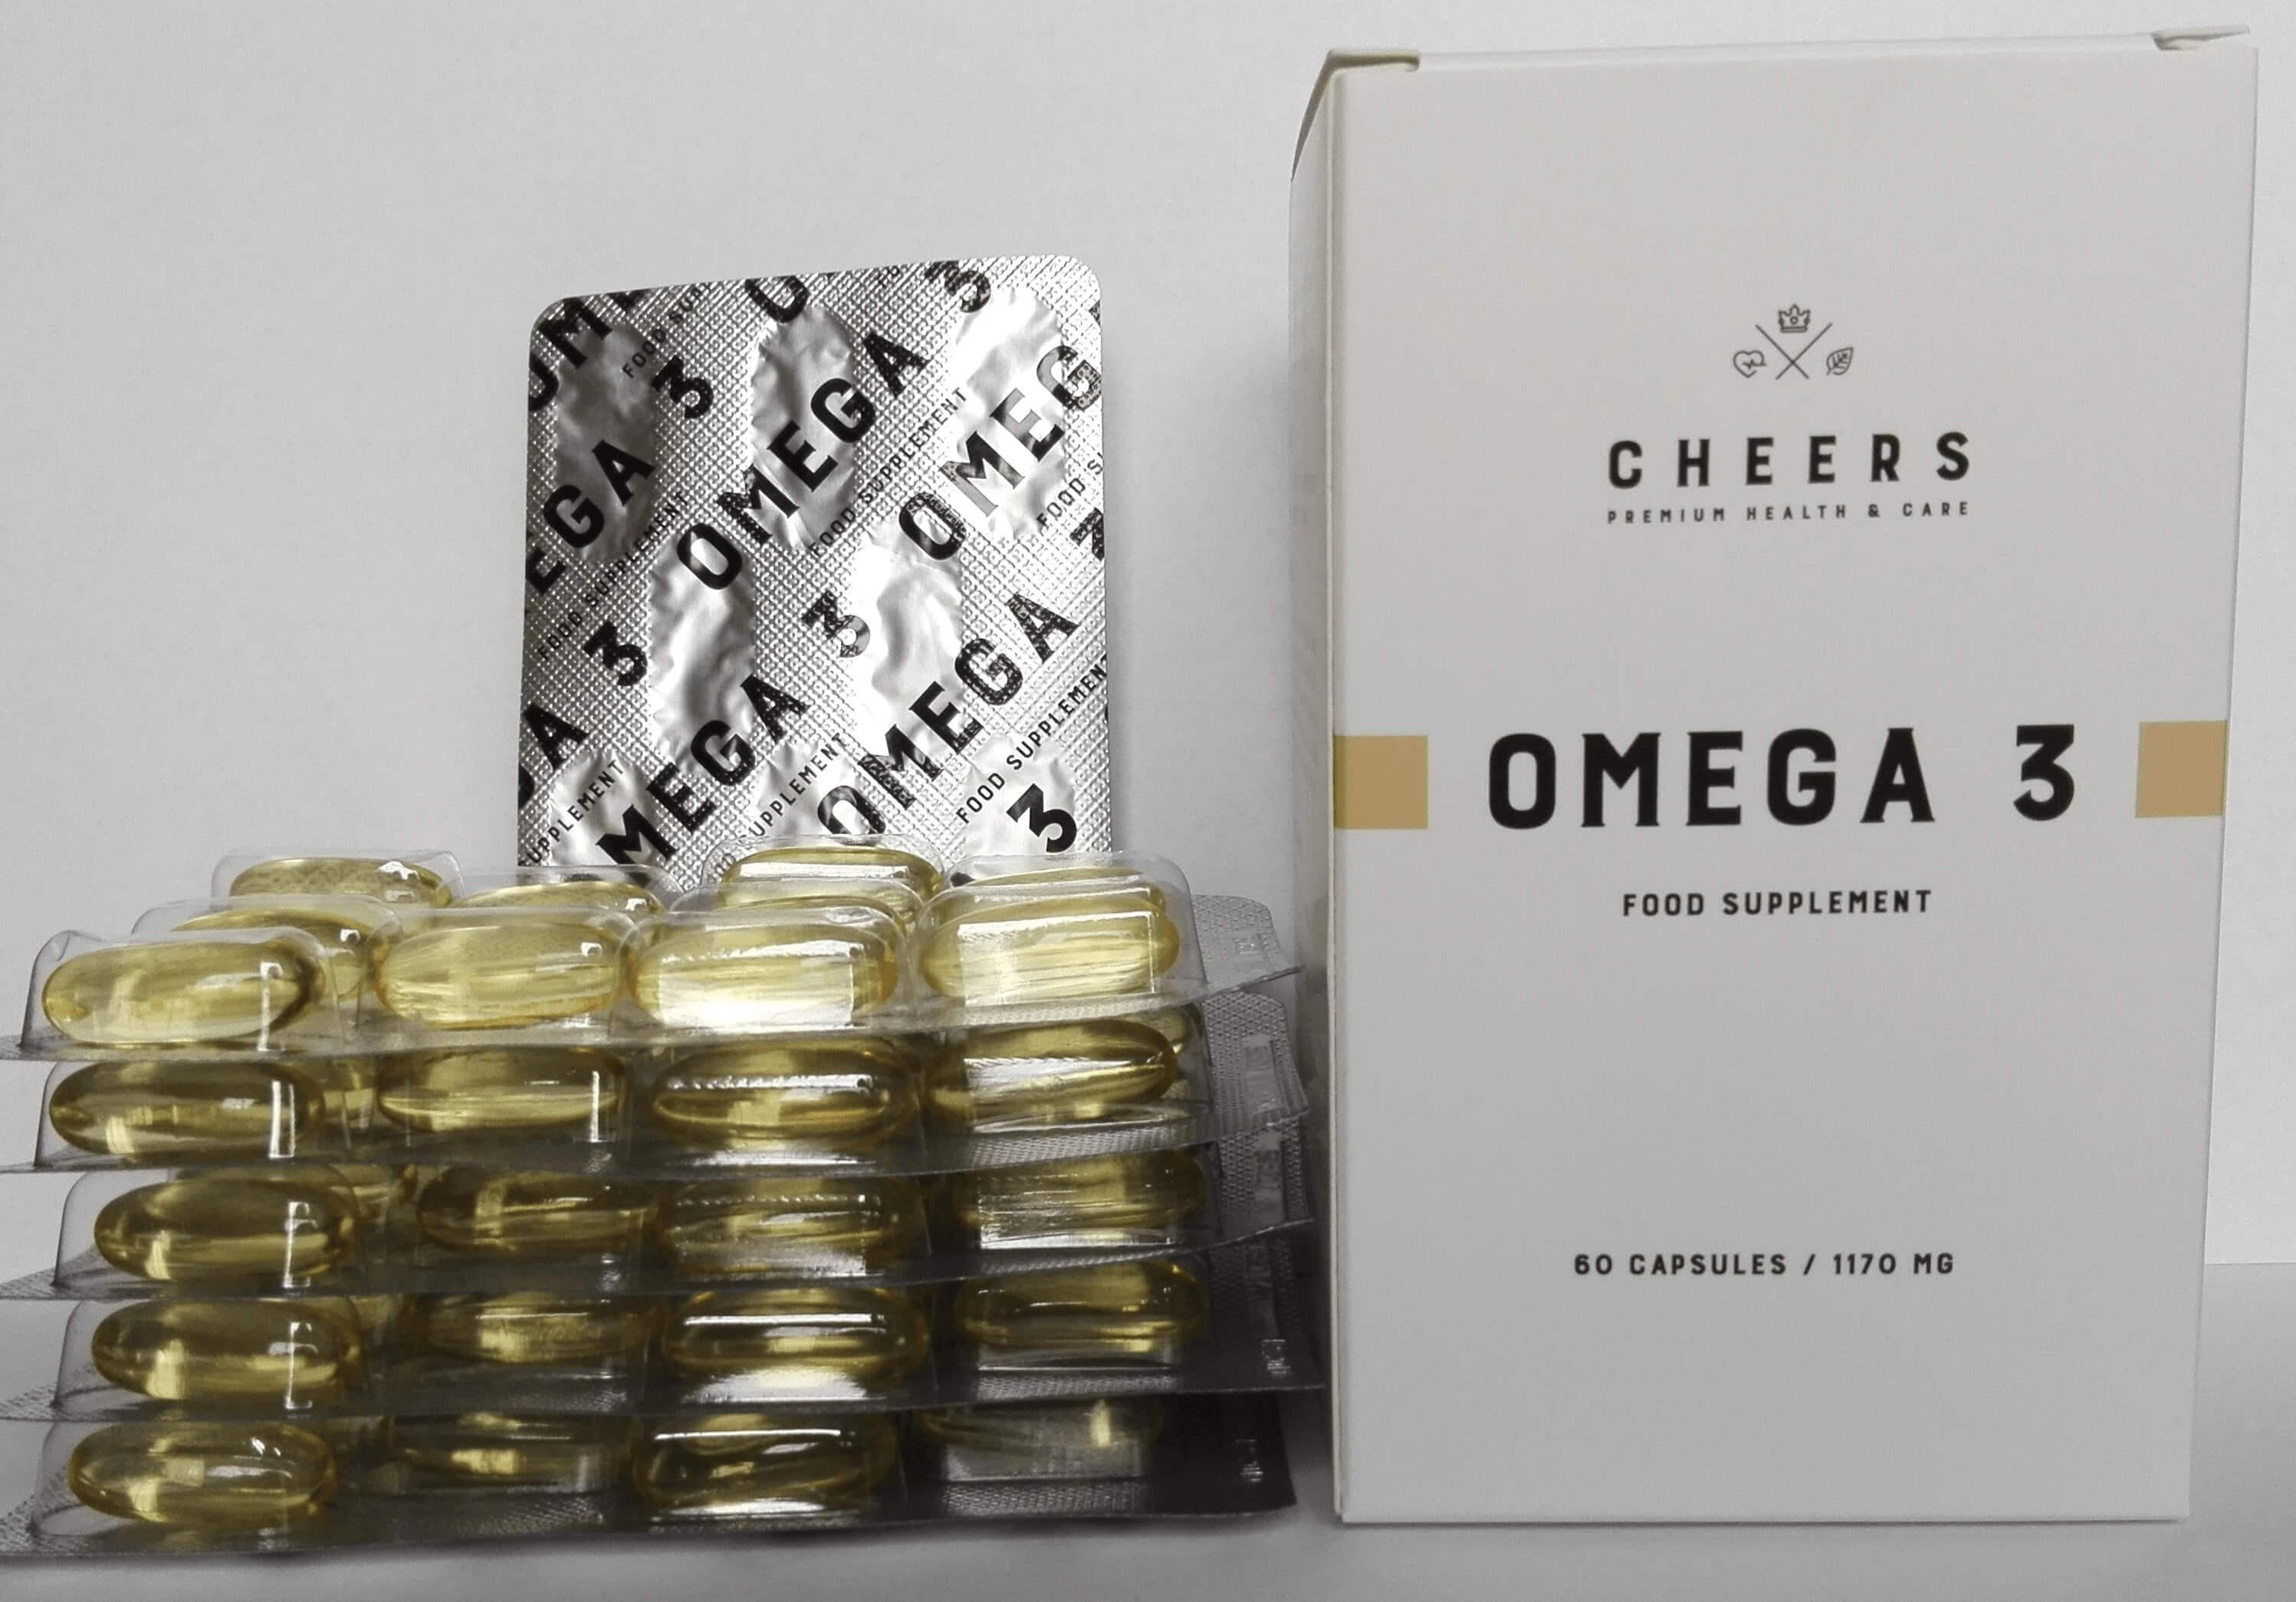 Omega 3 Cheers